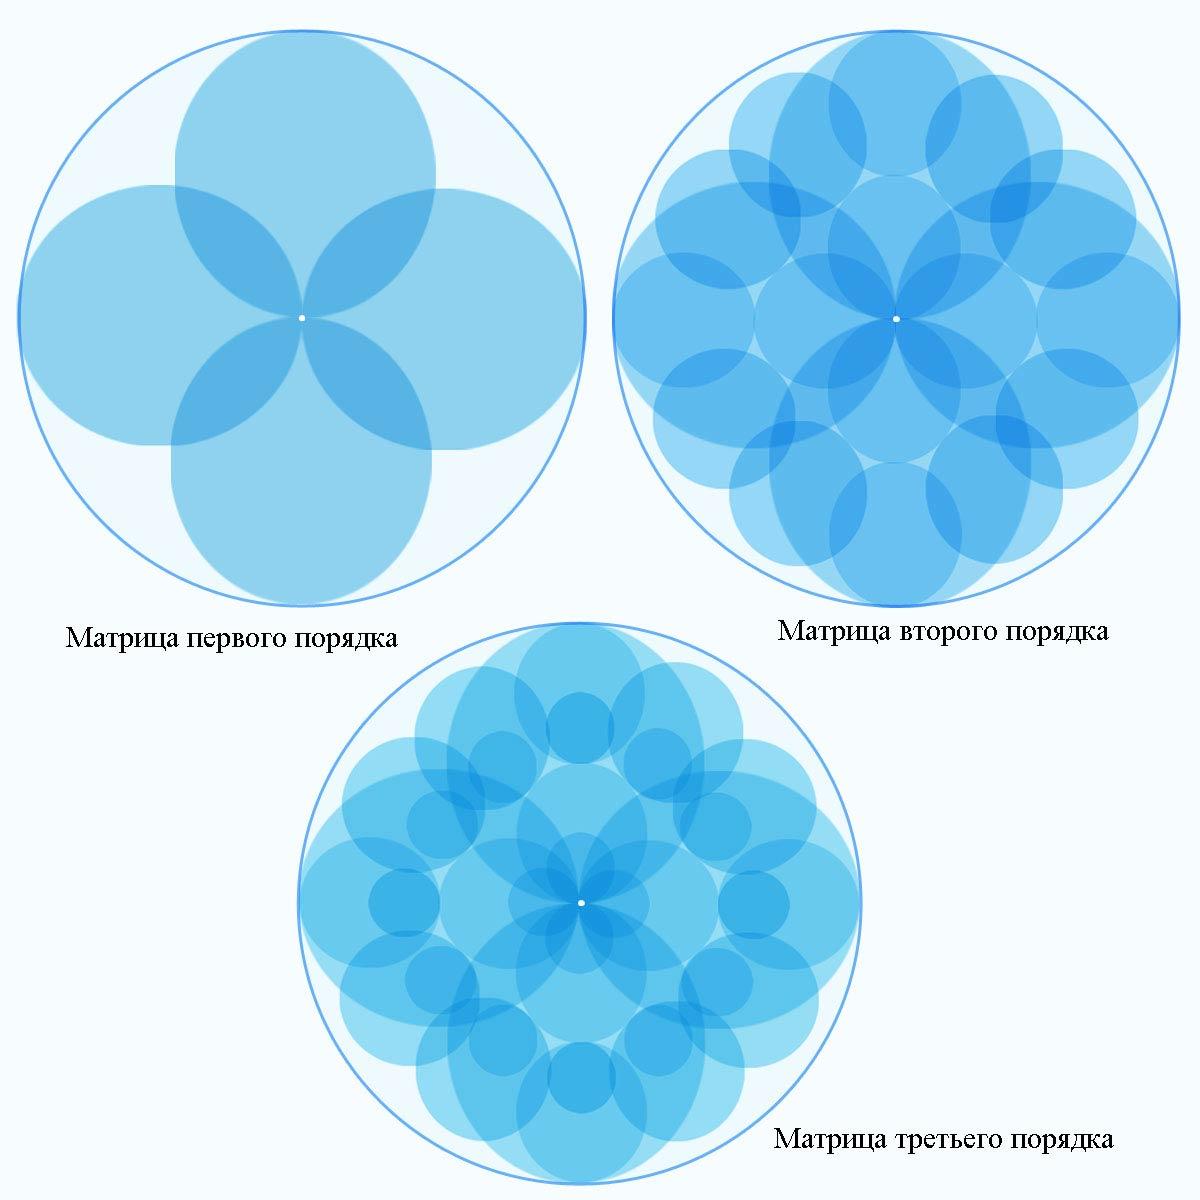 http://merkab.narod.ru/hologram_universe/033.jpg